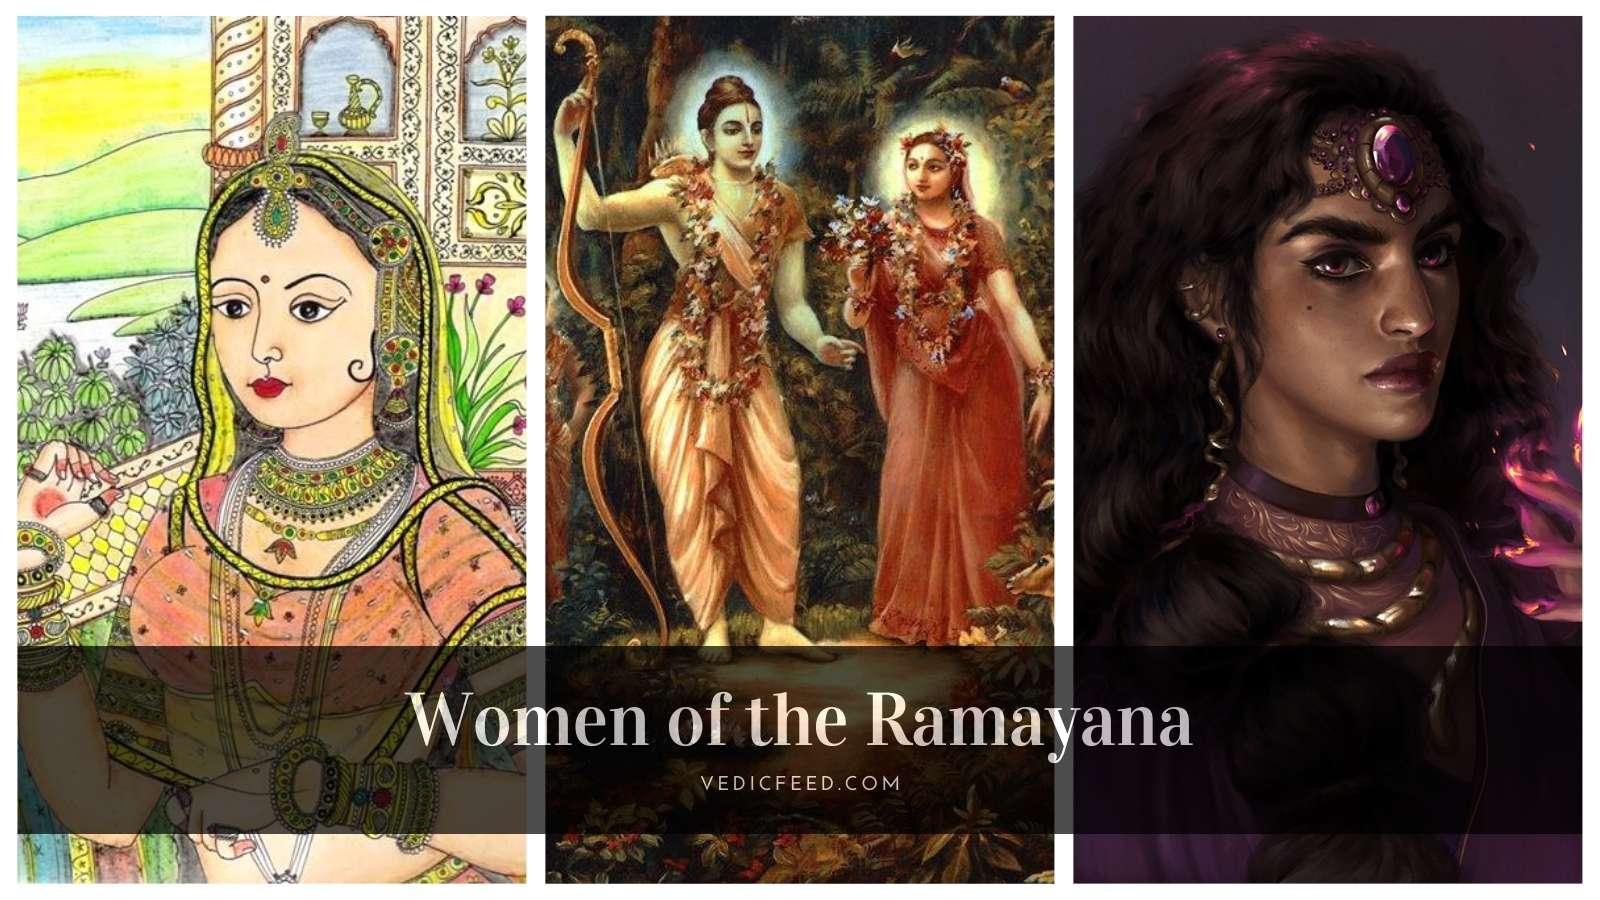 Women of the Ramayana